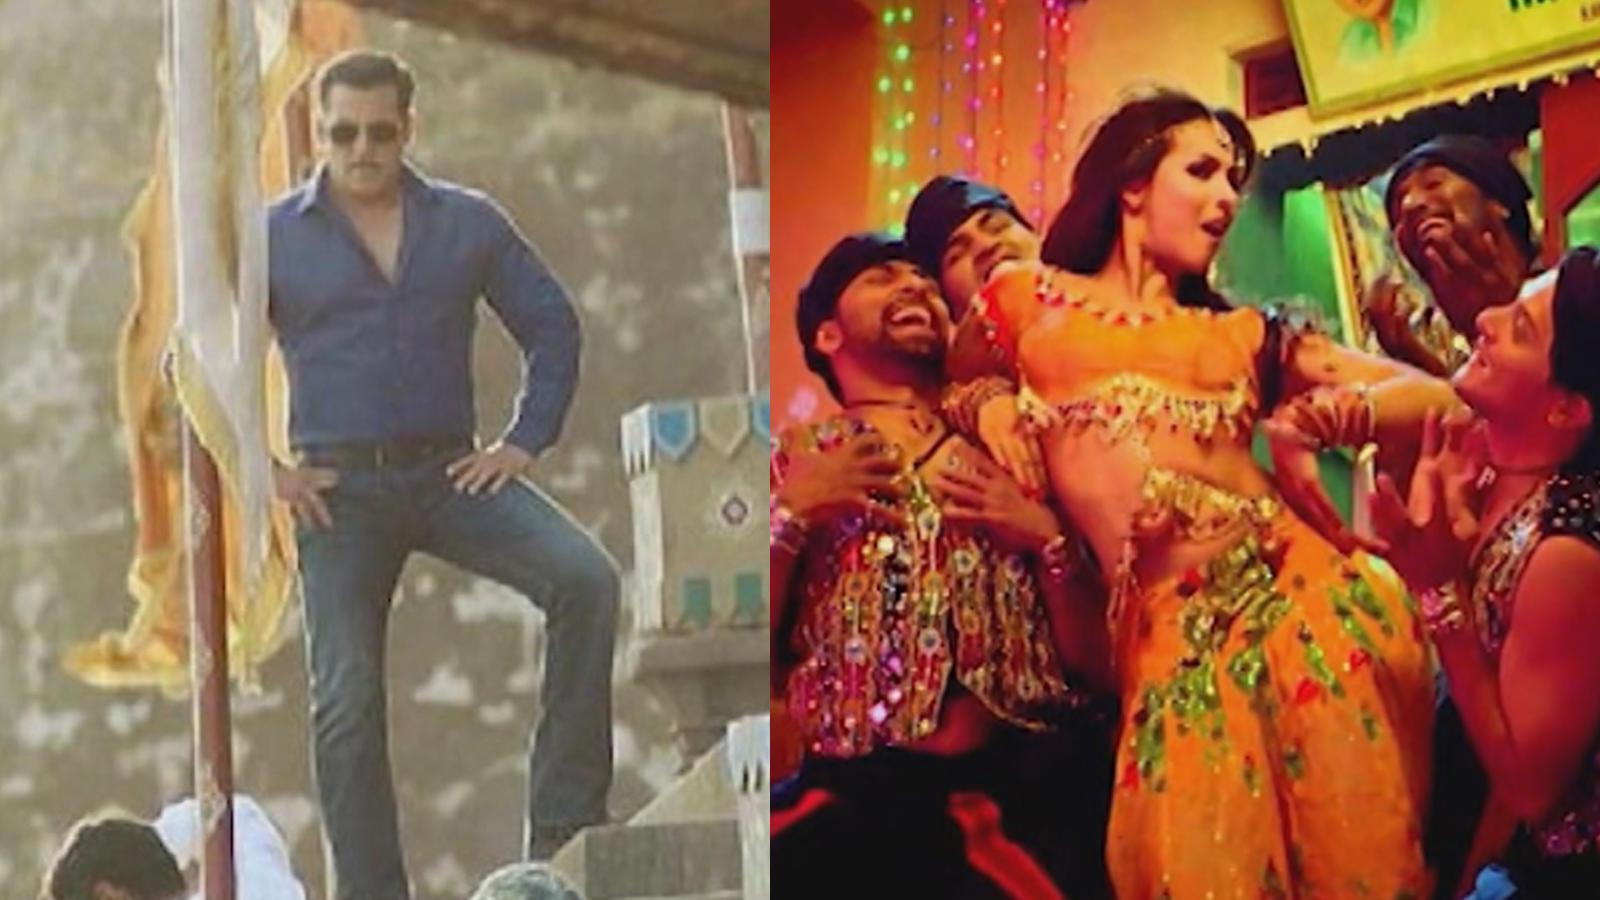 Dabangg 3: Salman Khan's 'Munna Badnam' to replace Malaika Arora's 'Munni Badnam' song